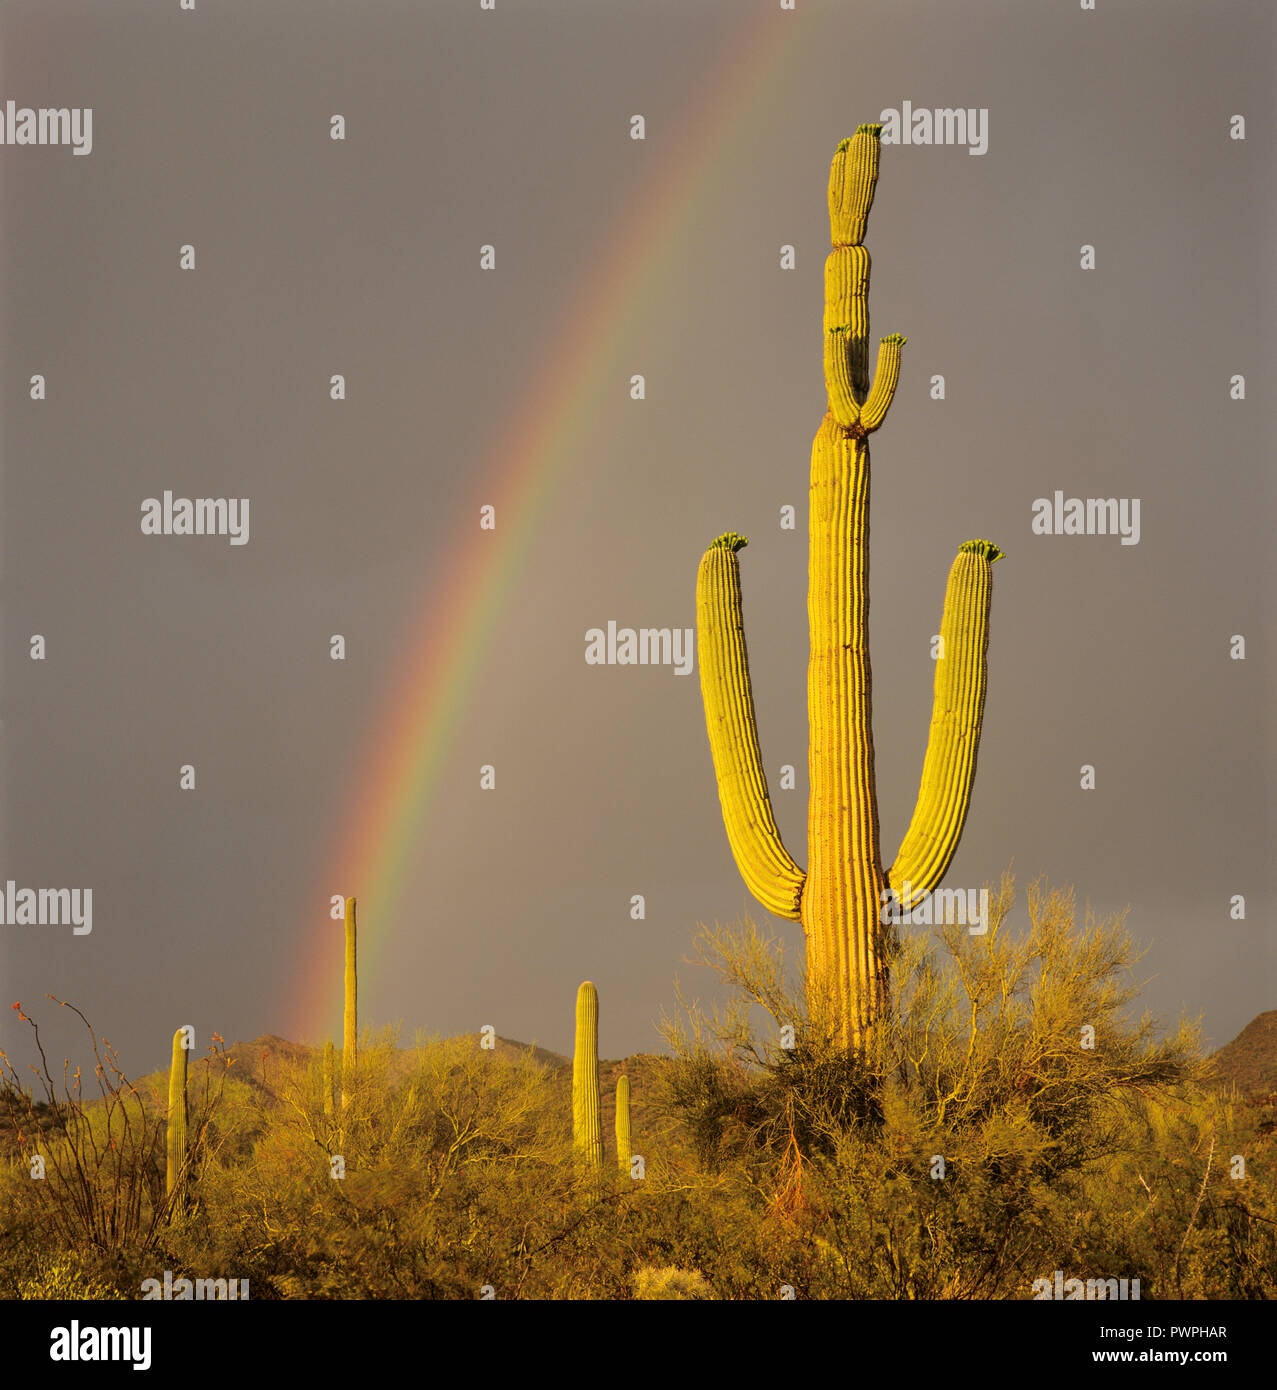 Saguaro Kaktus mit Regenbogen hinter, Sonoran Wüste, Arizona, USA Stockfoto